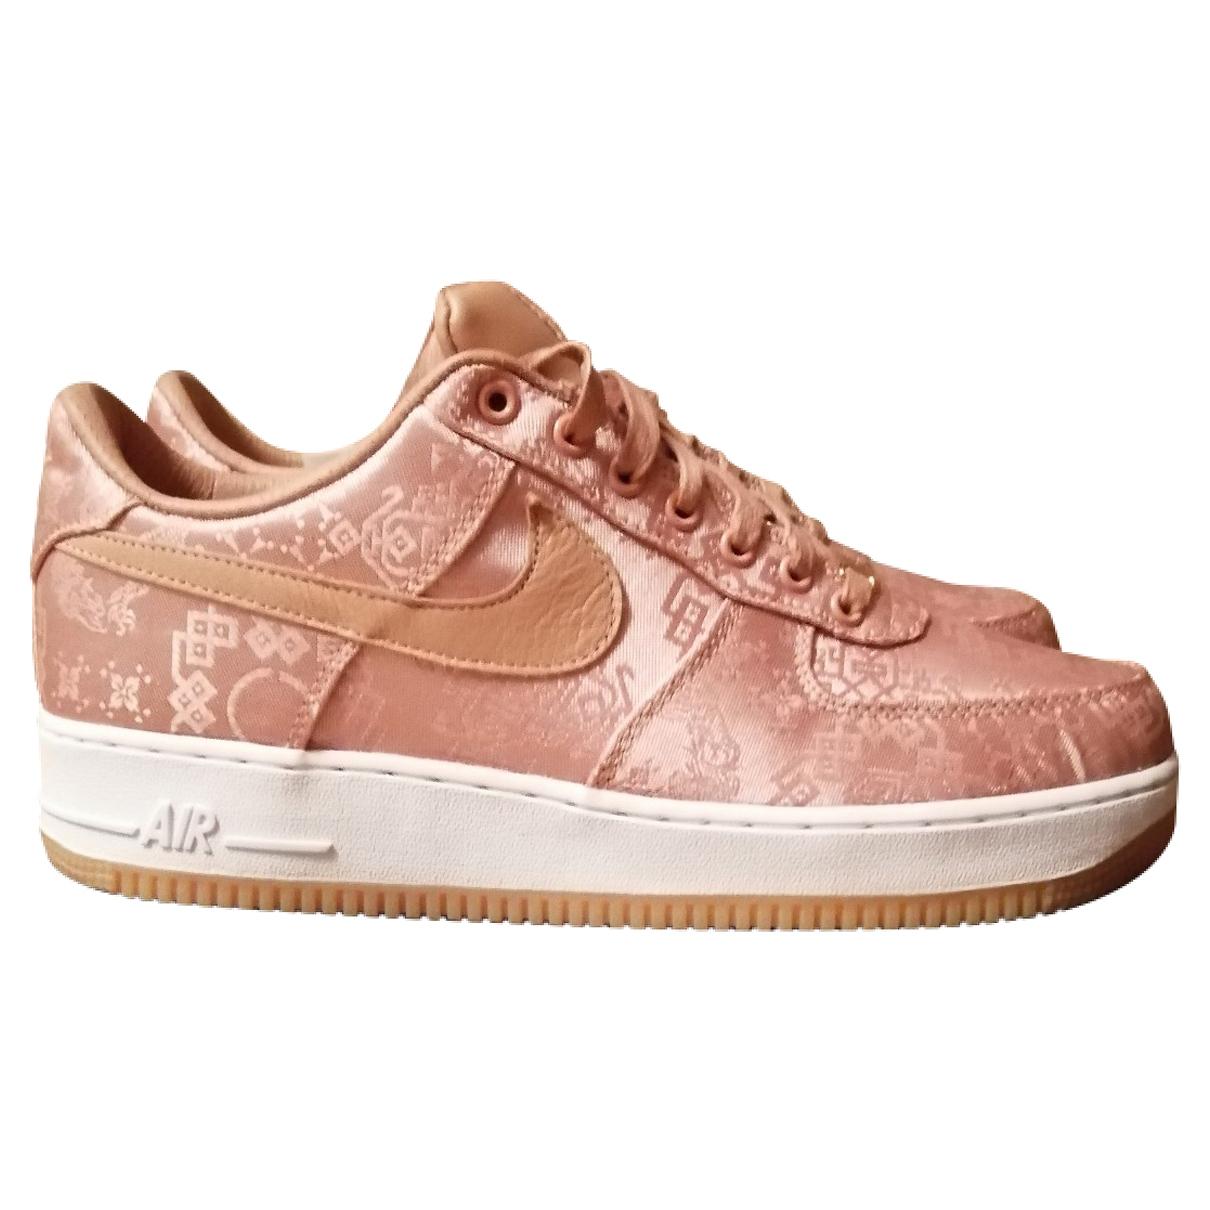 Nike - Baskets Air Force 1 pour homme en toile - rose